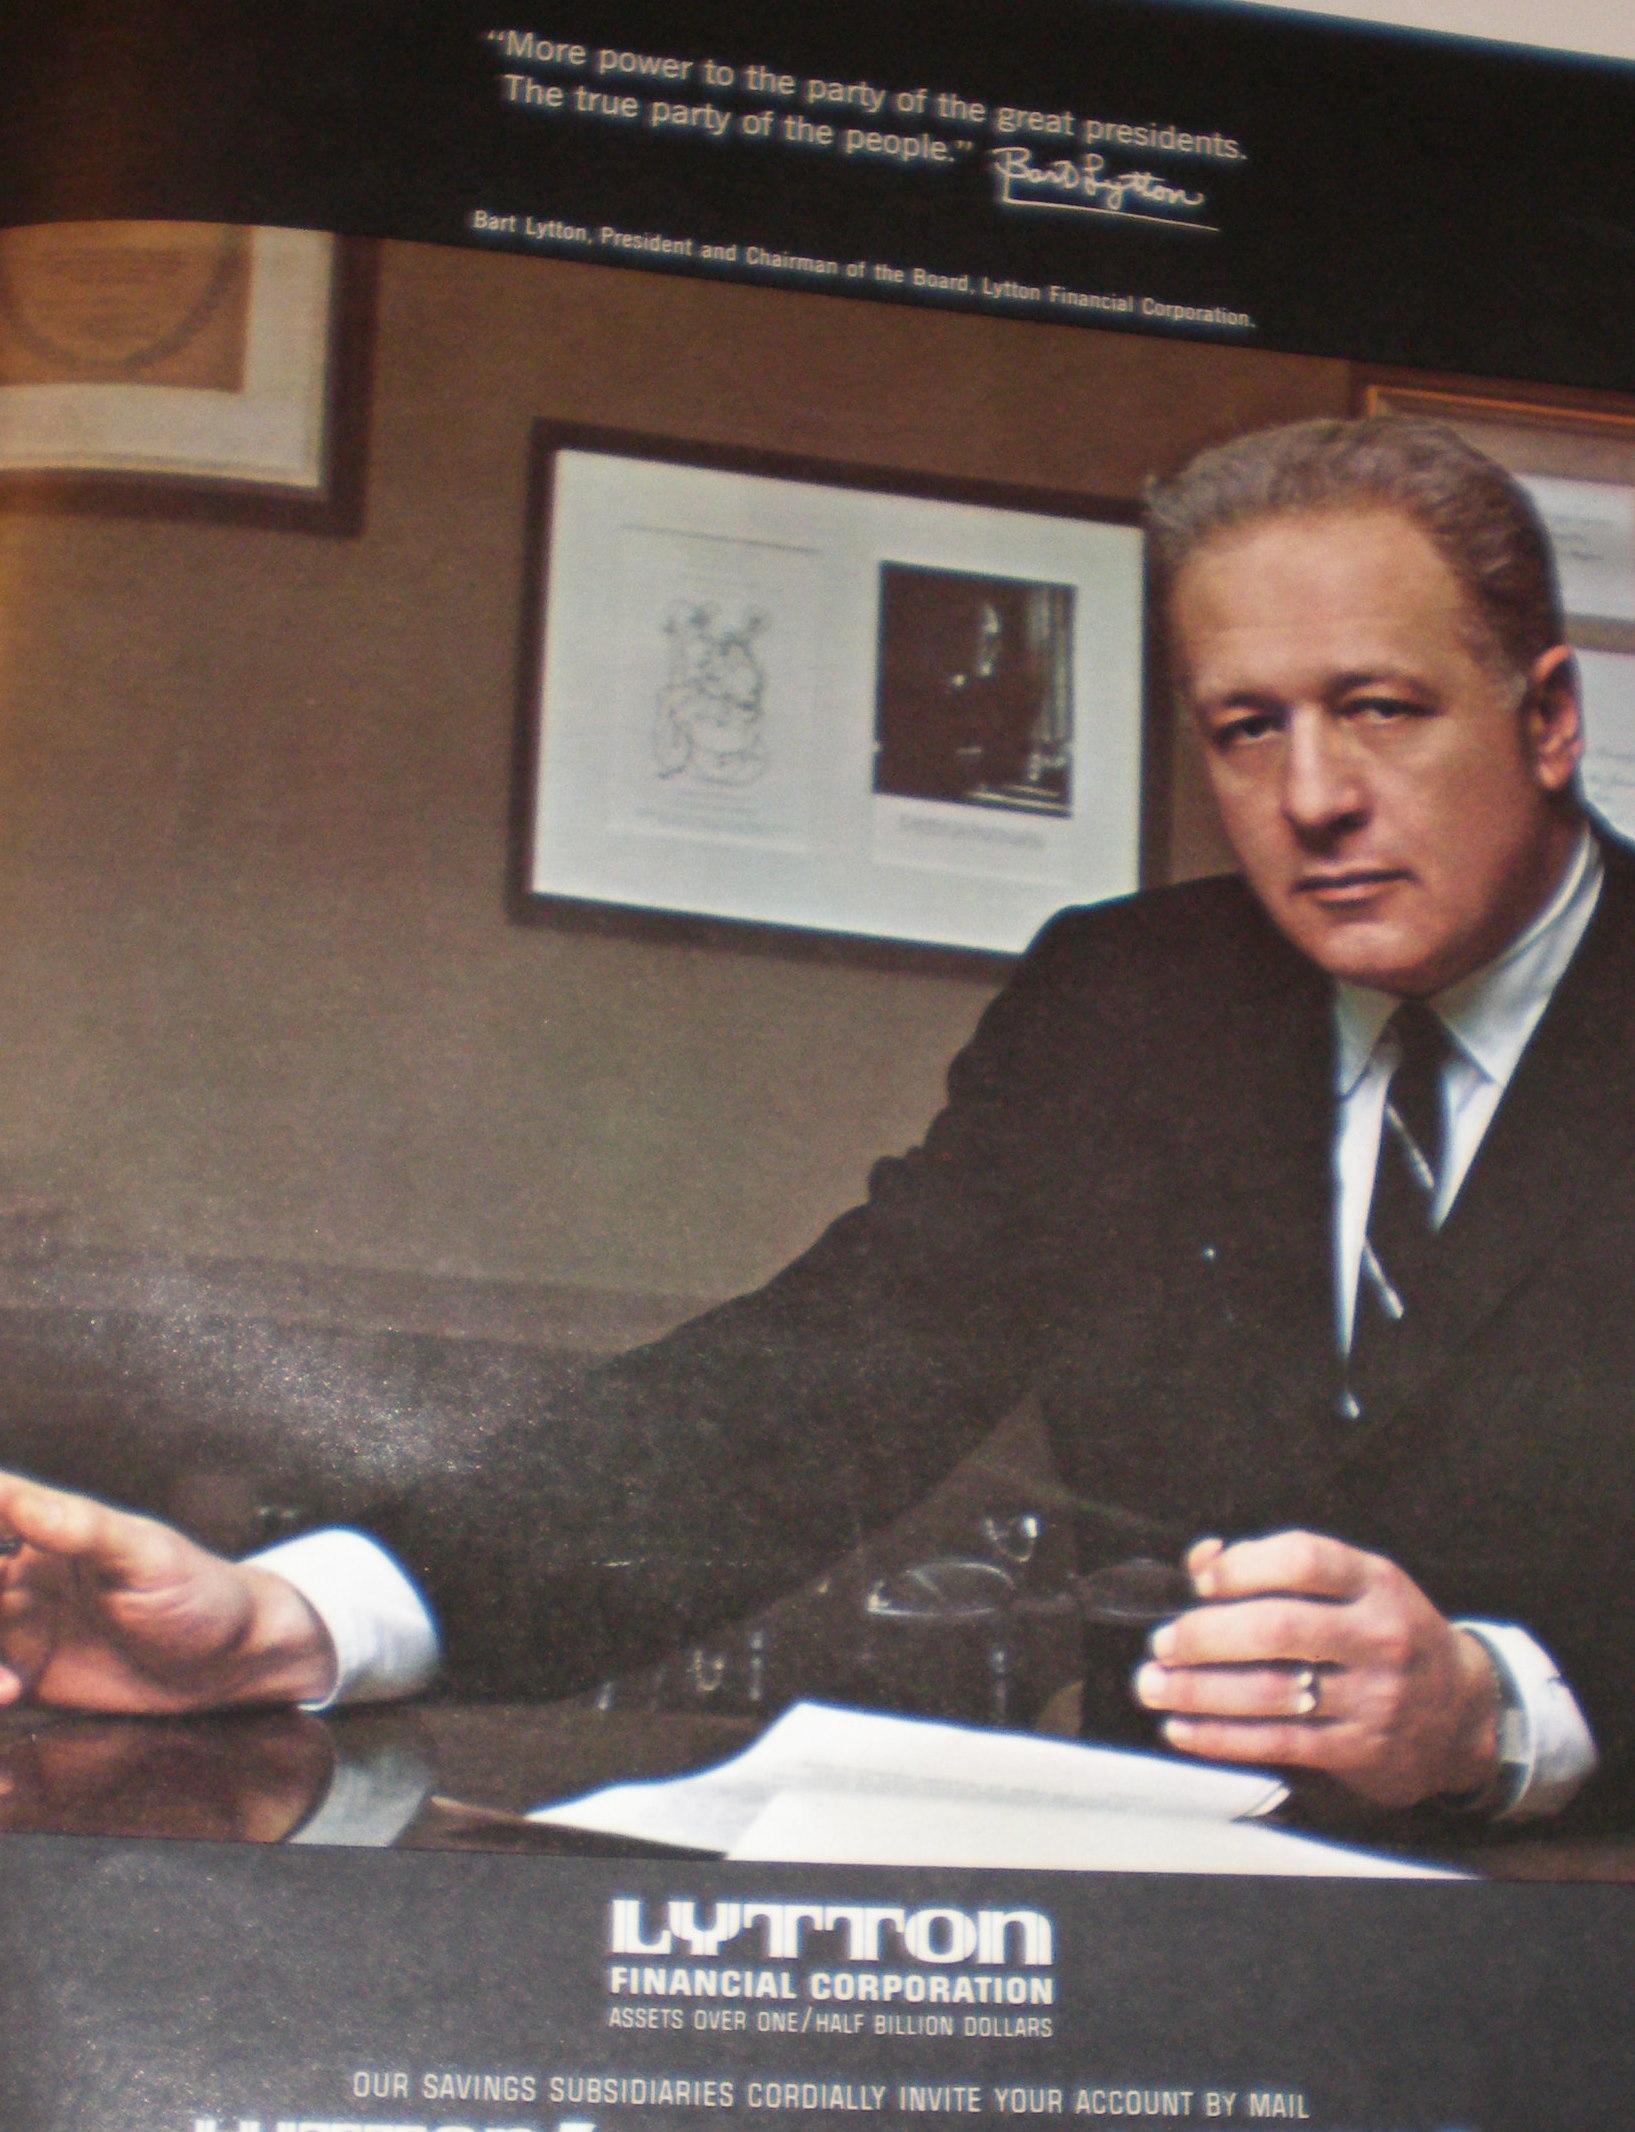 Bart Lytton of Lytton Financial